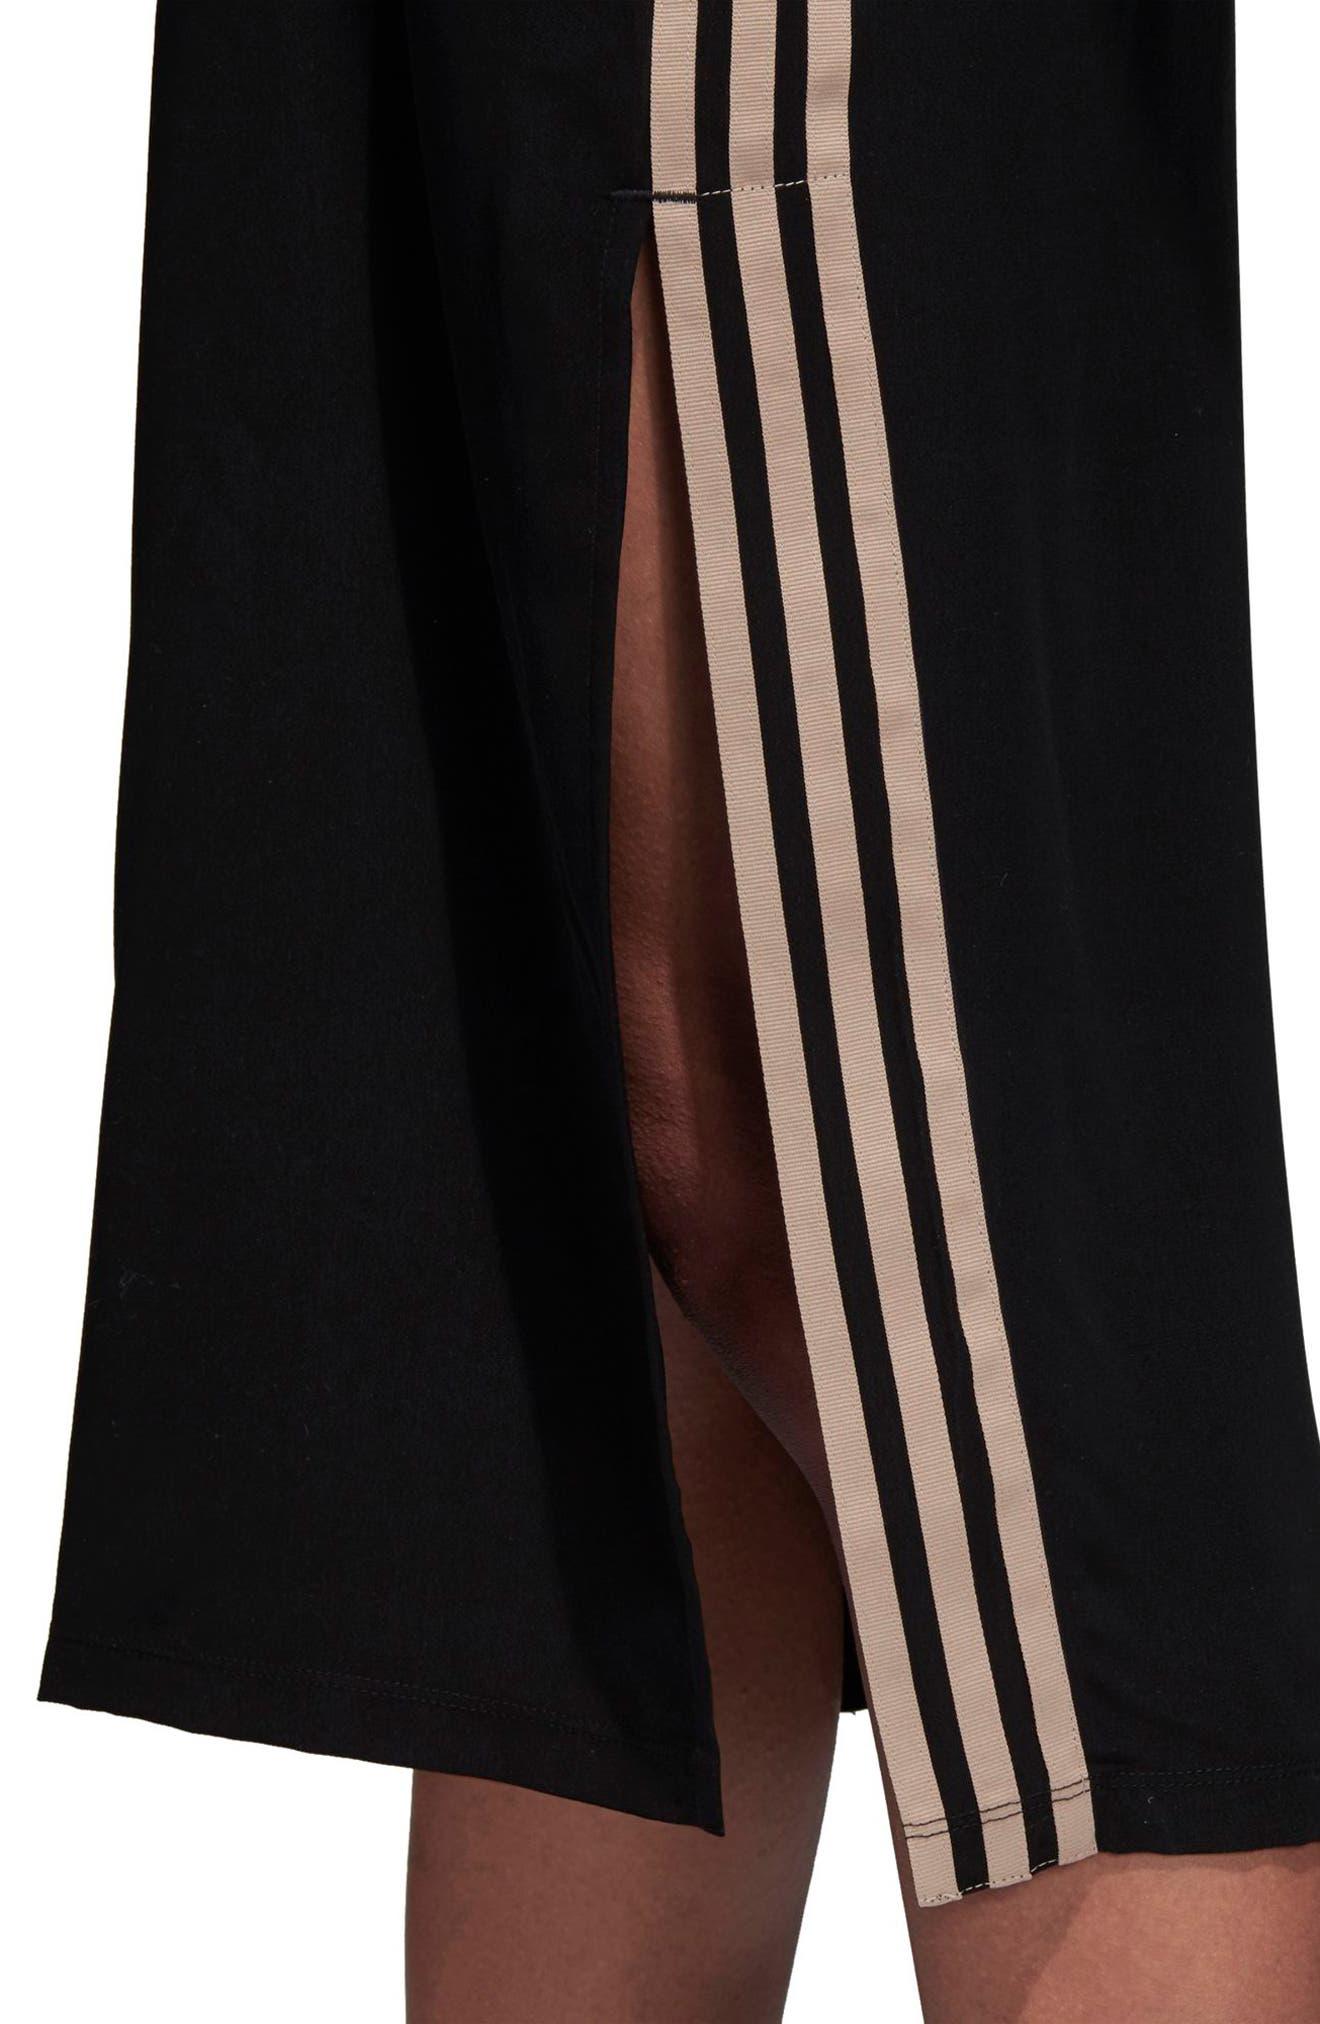 ADIDAS ORIGINALS,                             Midi Skirt with Shoulder Straps,                             Alternate thumbnail 6, color,                             001